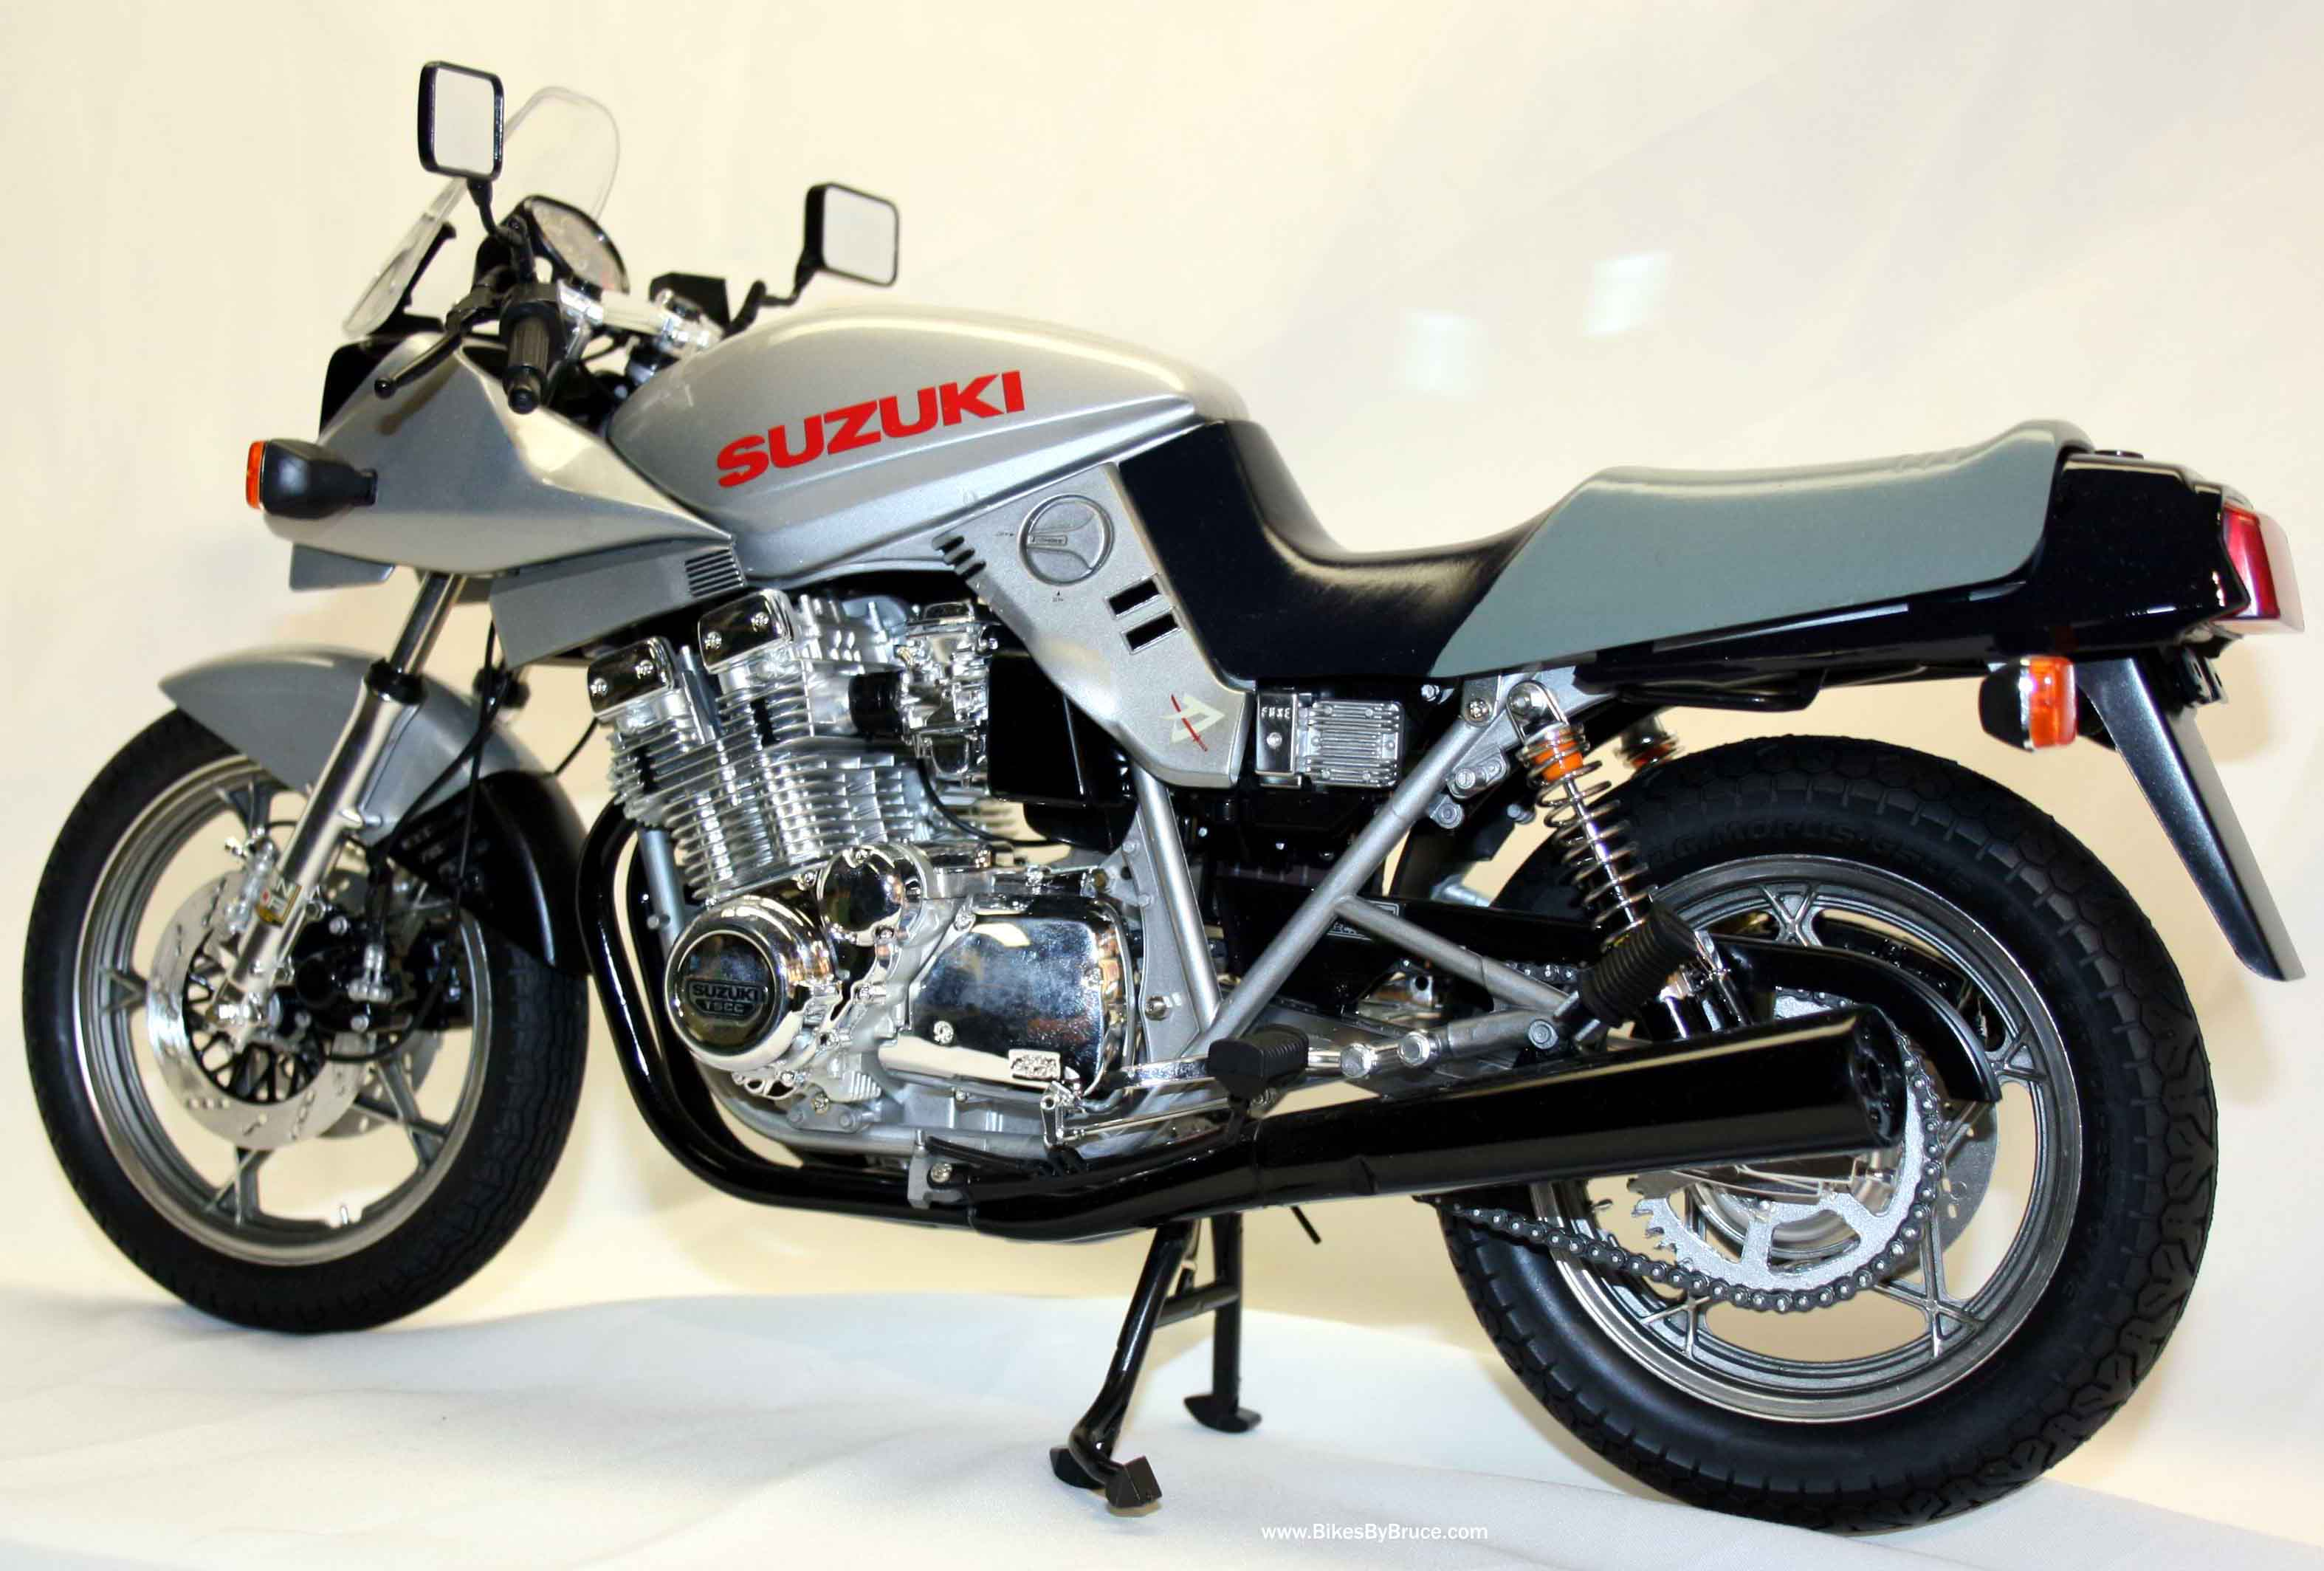 Suzuki Gsx Manual